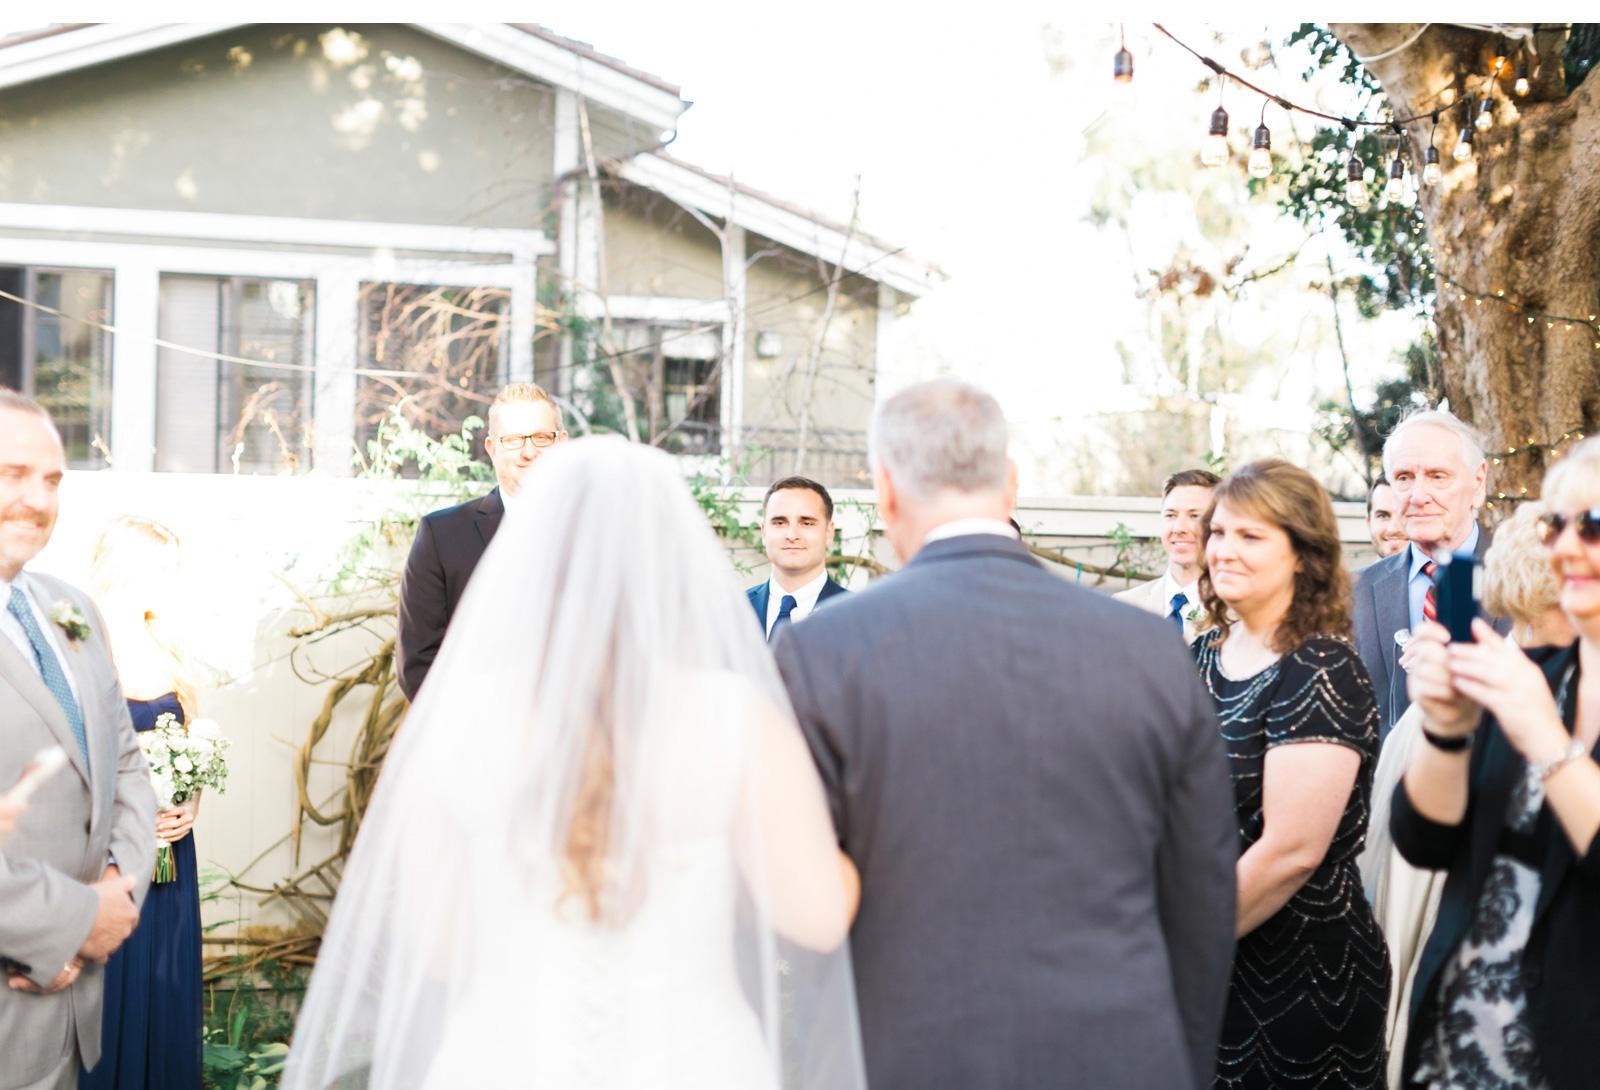 Private-Estate-Backyard-Wedding-Natalie-Schutt-Photography_01.jpg